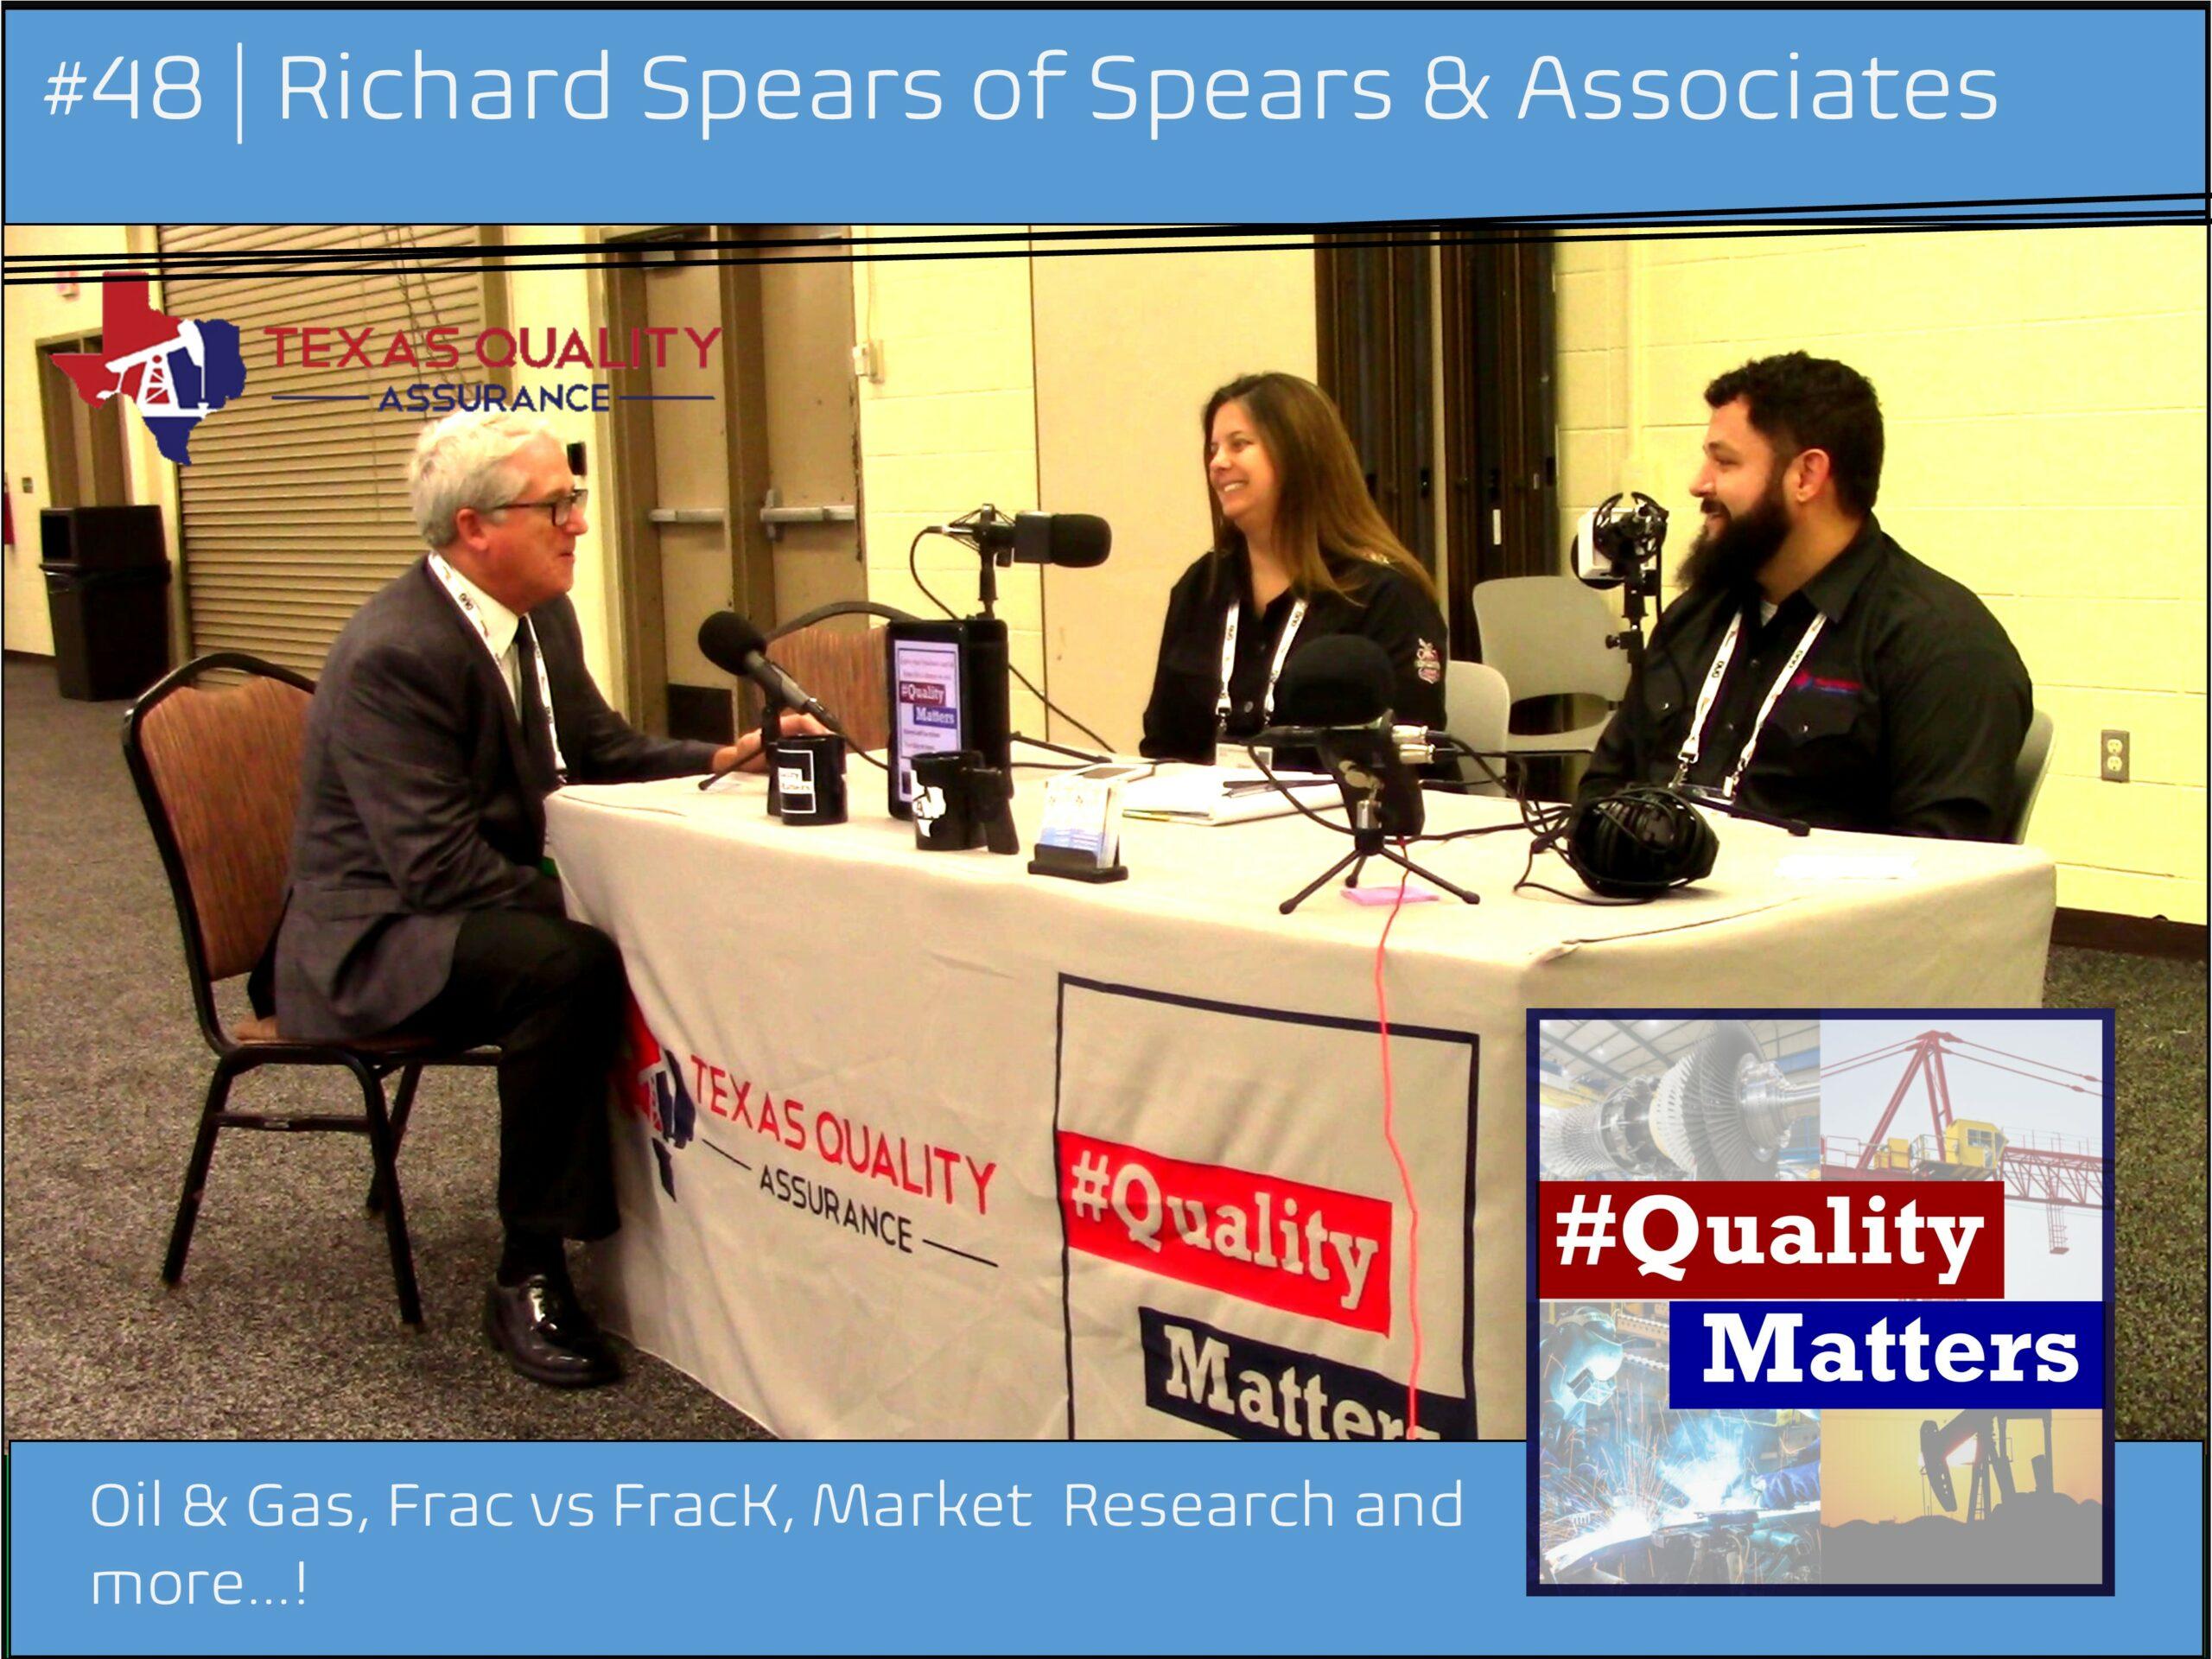 Oil & Gas - Market Research - Frac & FracK